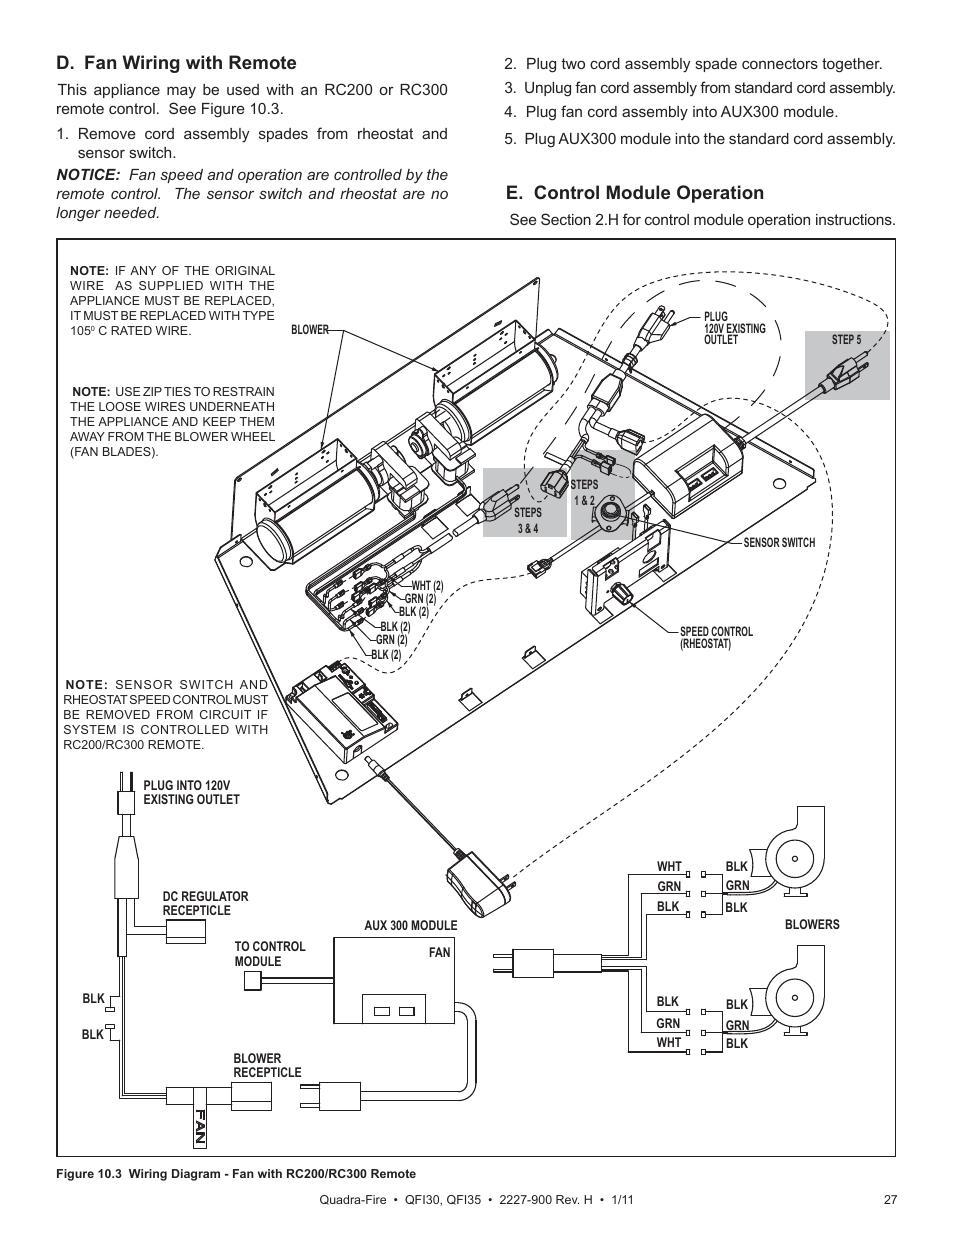 D Fan Wiring With Remote E Control Module Operation Quadra Fire A Rheostat Qf130 User Manual Page 27 41